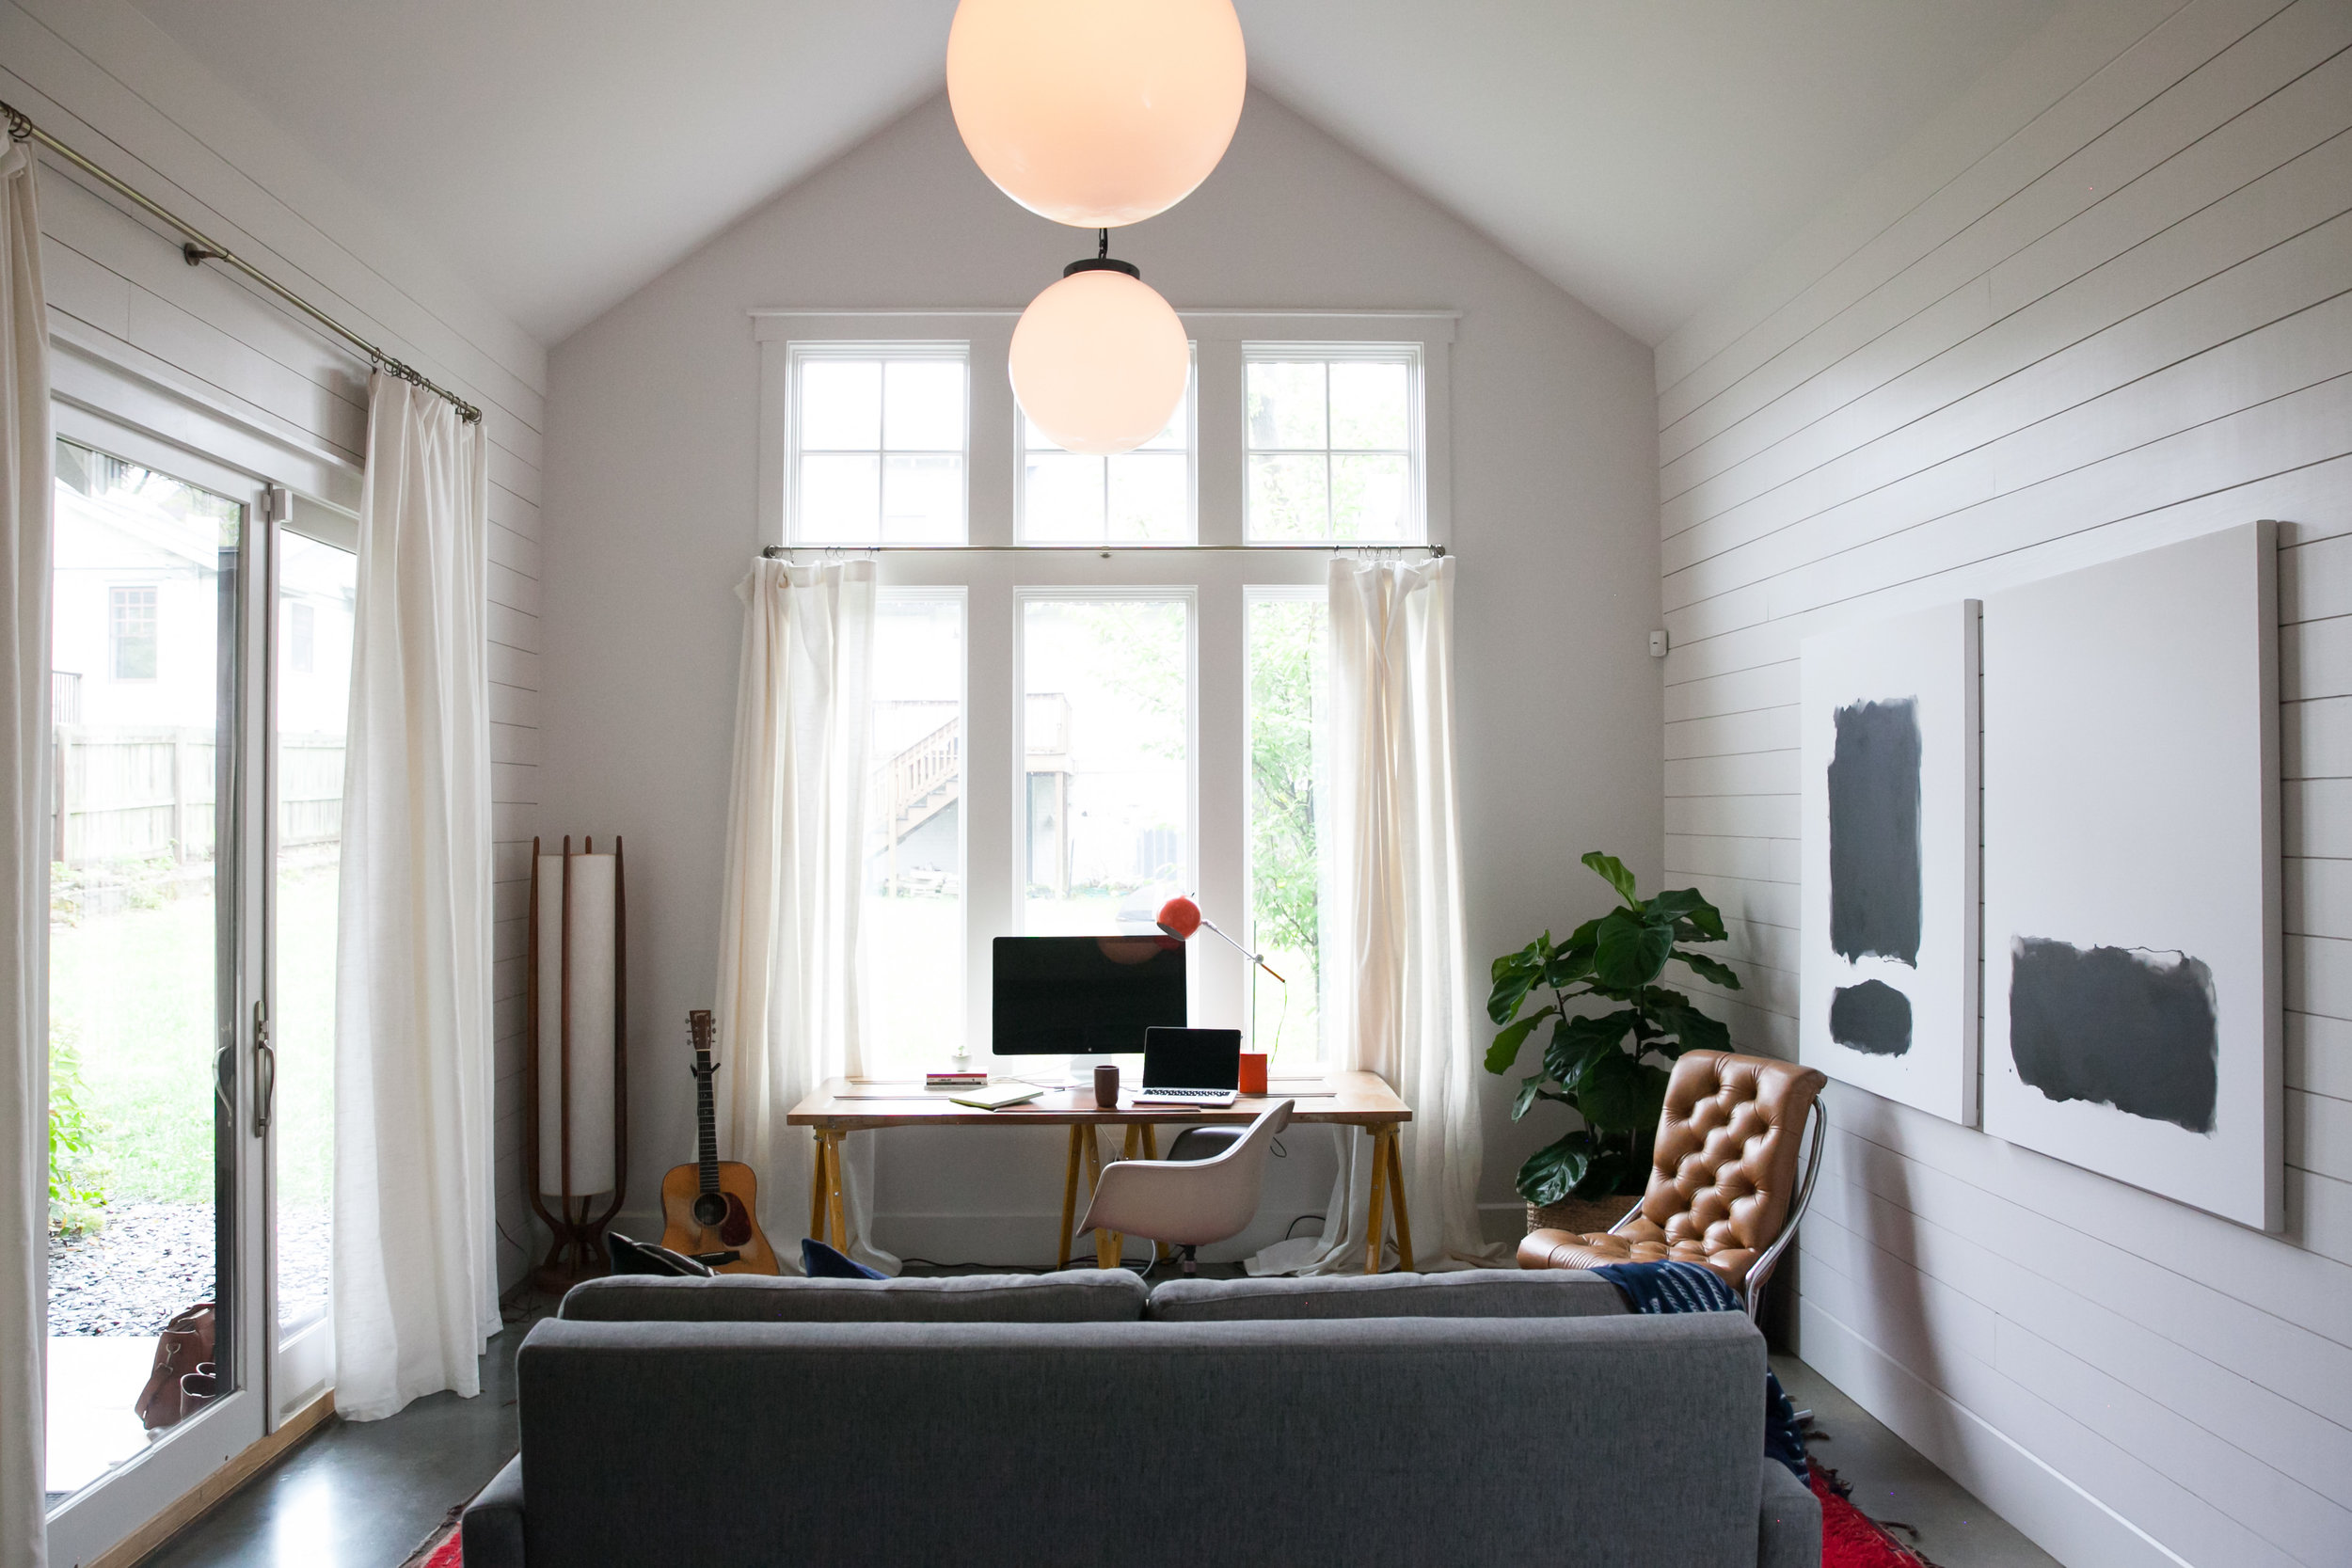 LisaDiederichPhotography_MattHomeTour_ApartmentTherapy-4.jpg